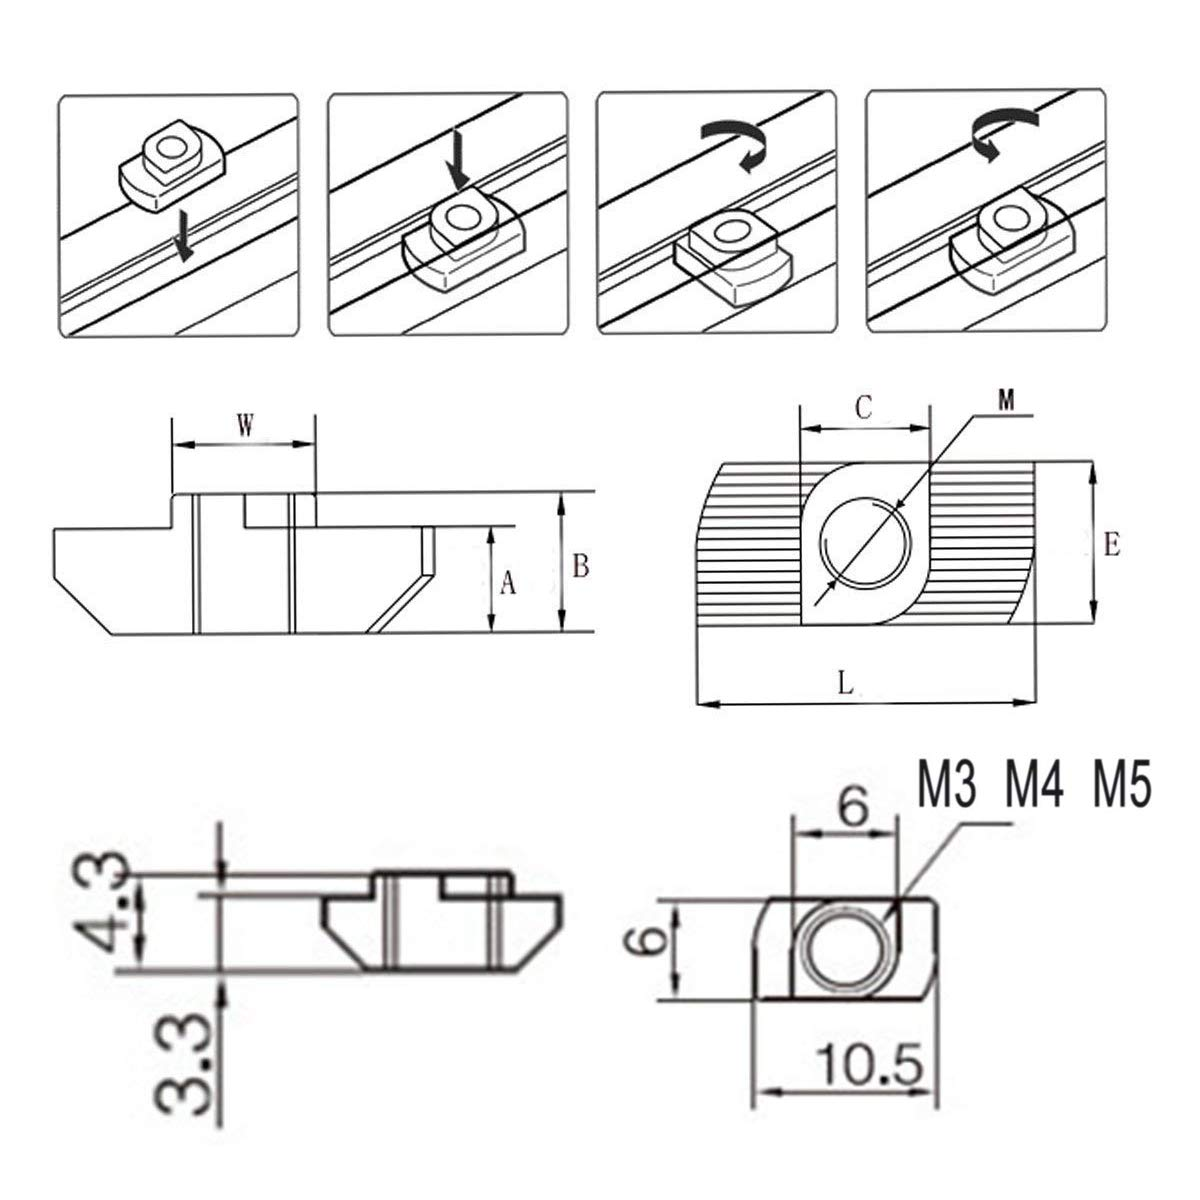 Mengger Tuerca en T Cabeza de martillo ranura hembra Tuercas Carredera 150 Piezas 20 Series M3// M4// M5 Kit Surtido Cierre para Perfil de Aluminio T-tuerca